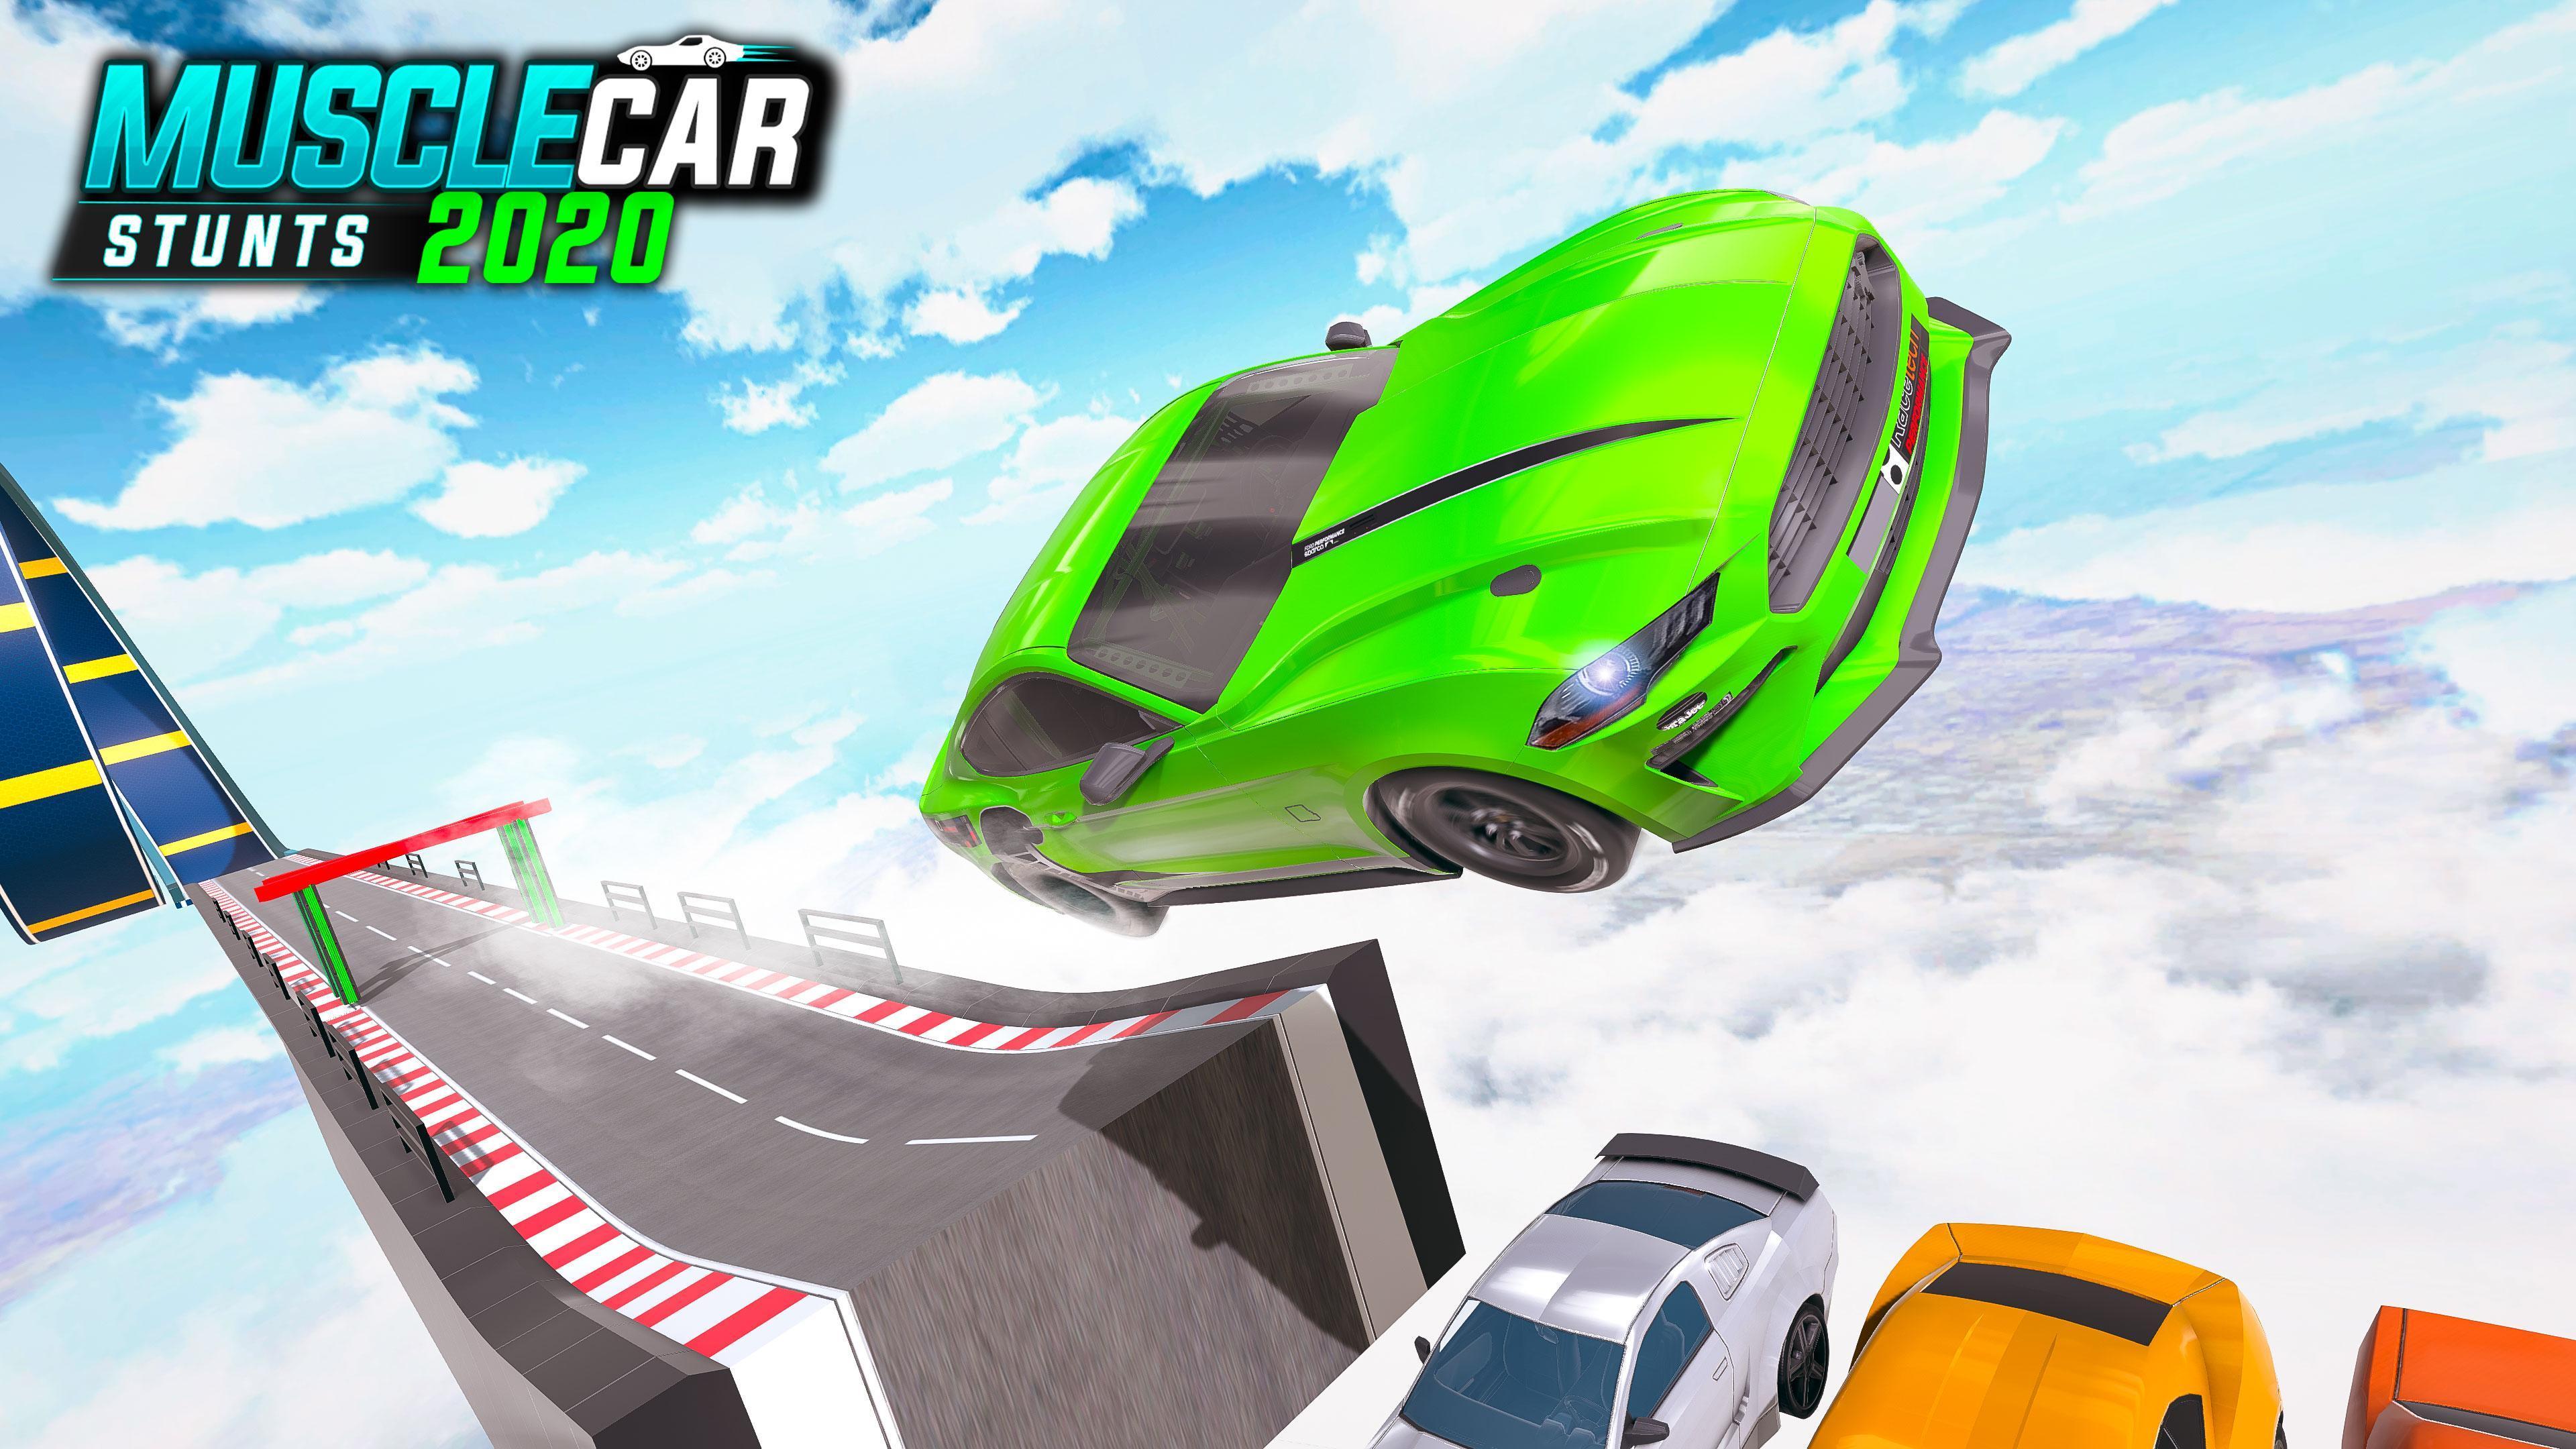 Muscle Car Stunts 2020 Mega Ramp Stunt Car Games 1.0.9 Screenshot 23